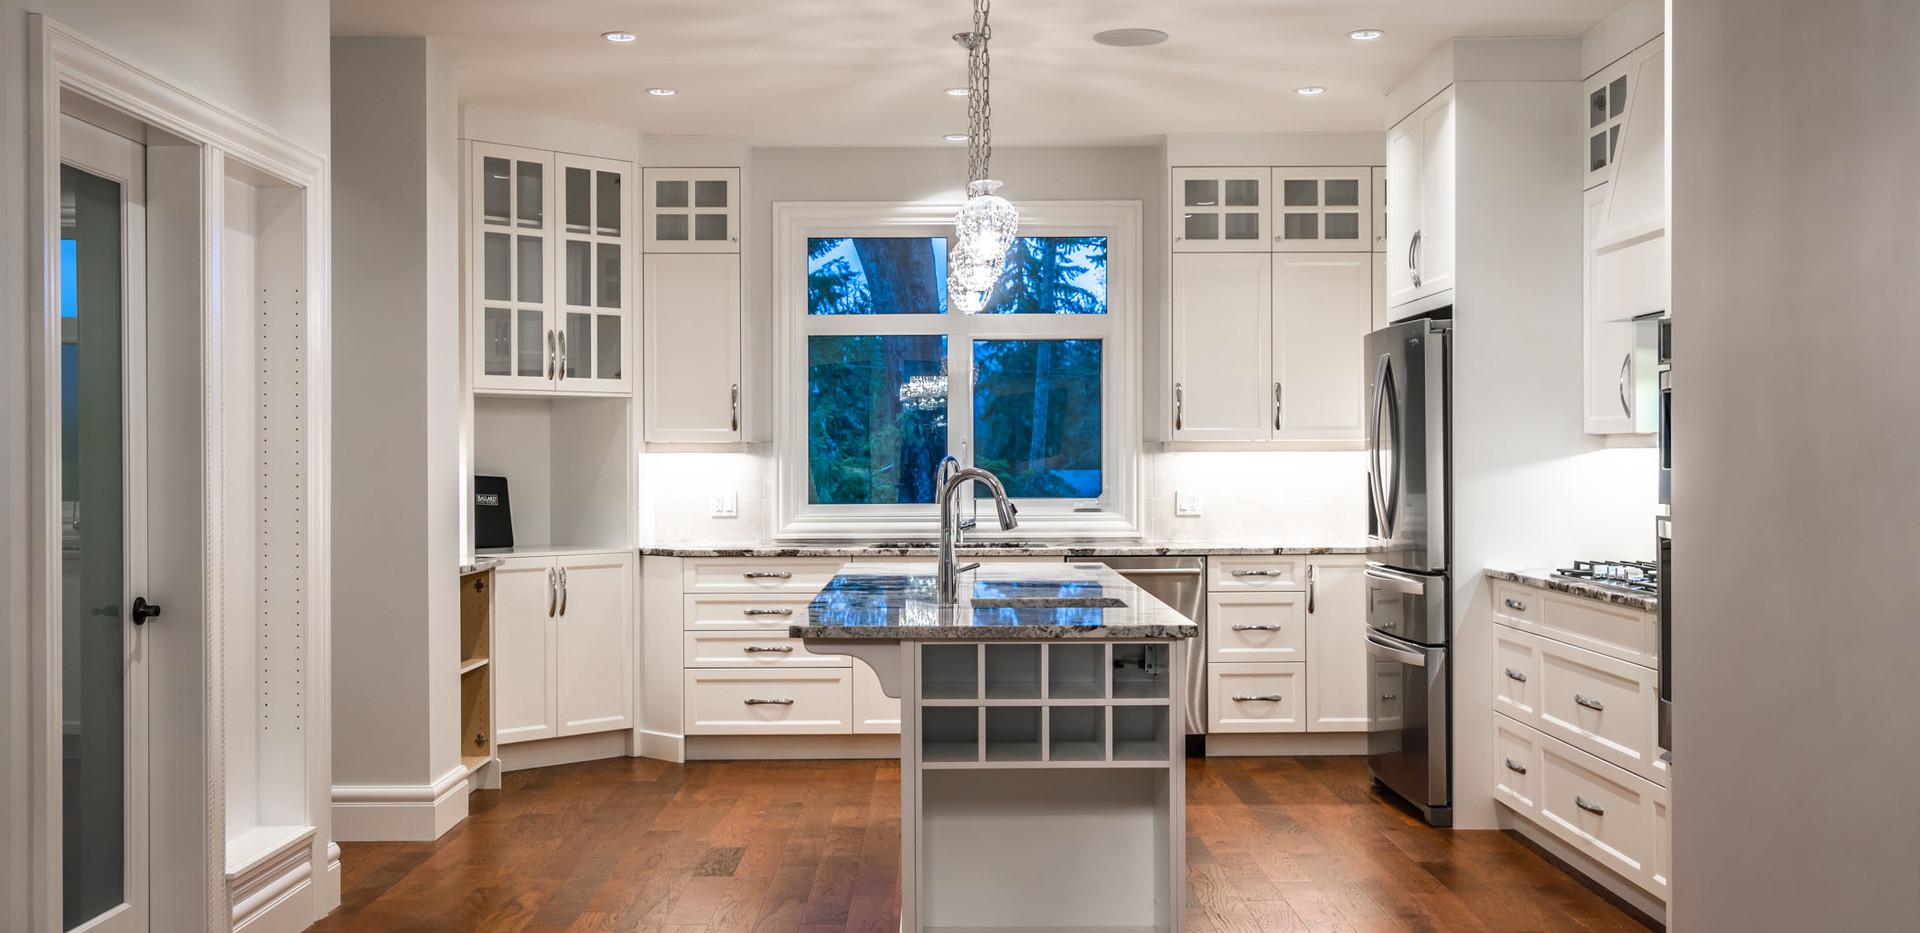 2847 Ashcraft Main House Kitchen14.jpg